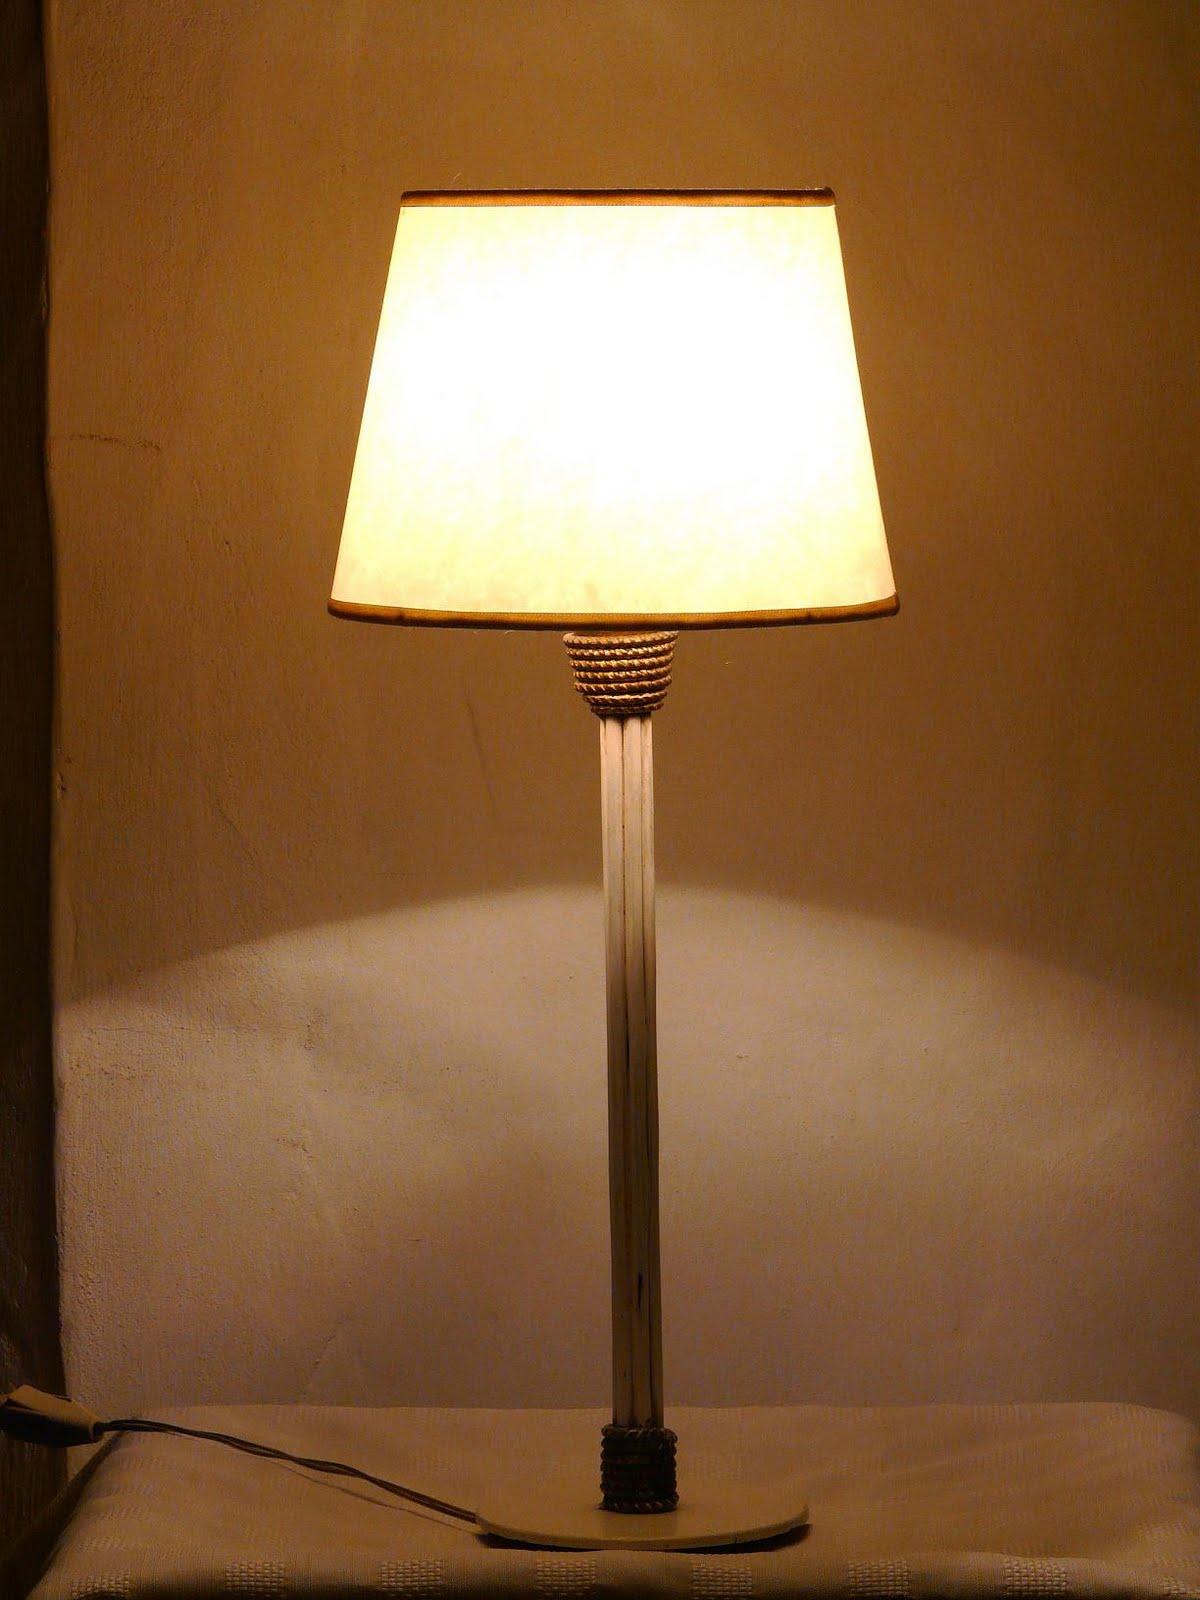 Pantallas magenta l mparas de mesa - Pantallas de lamparas de mesa ...